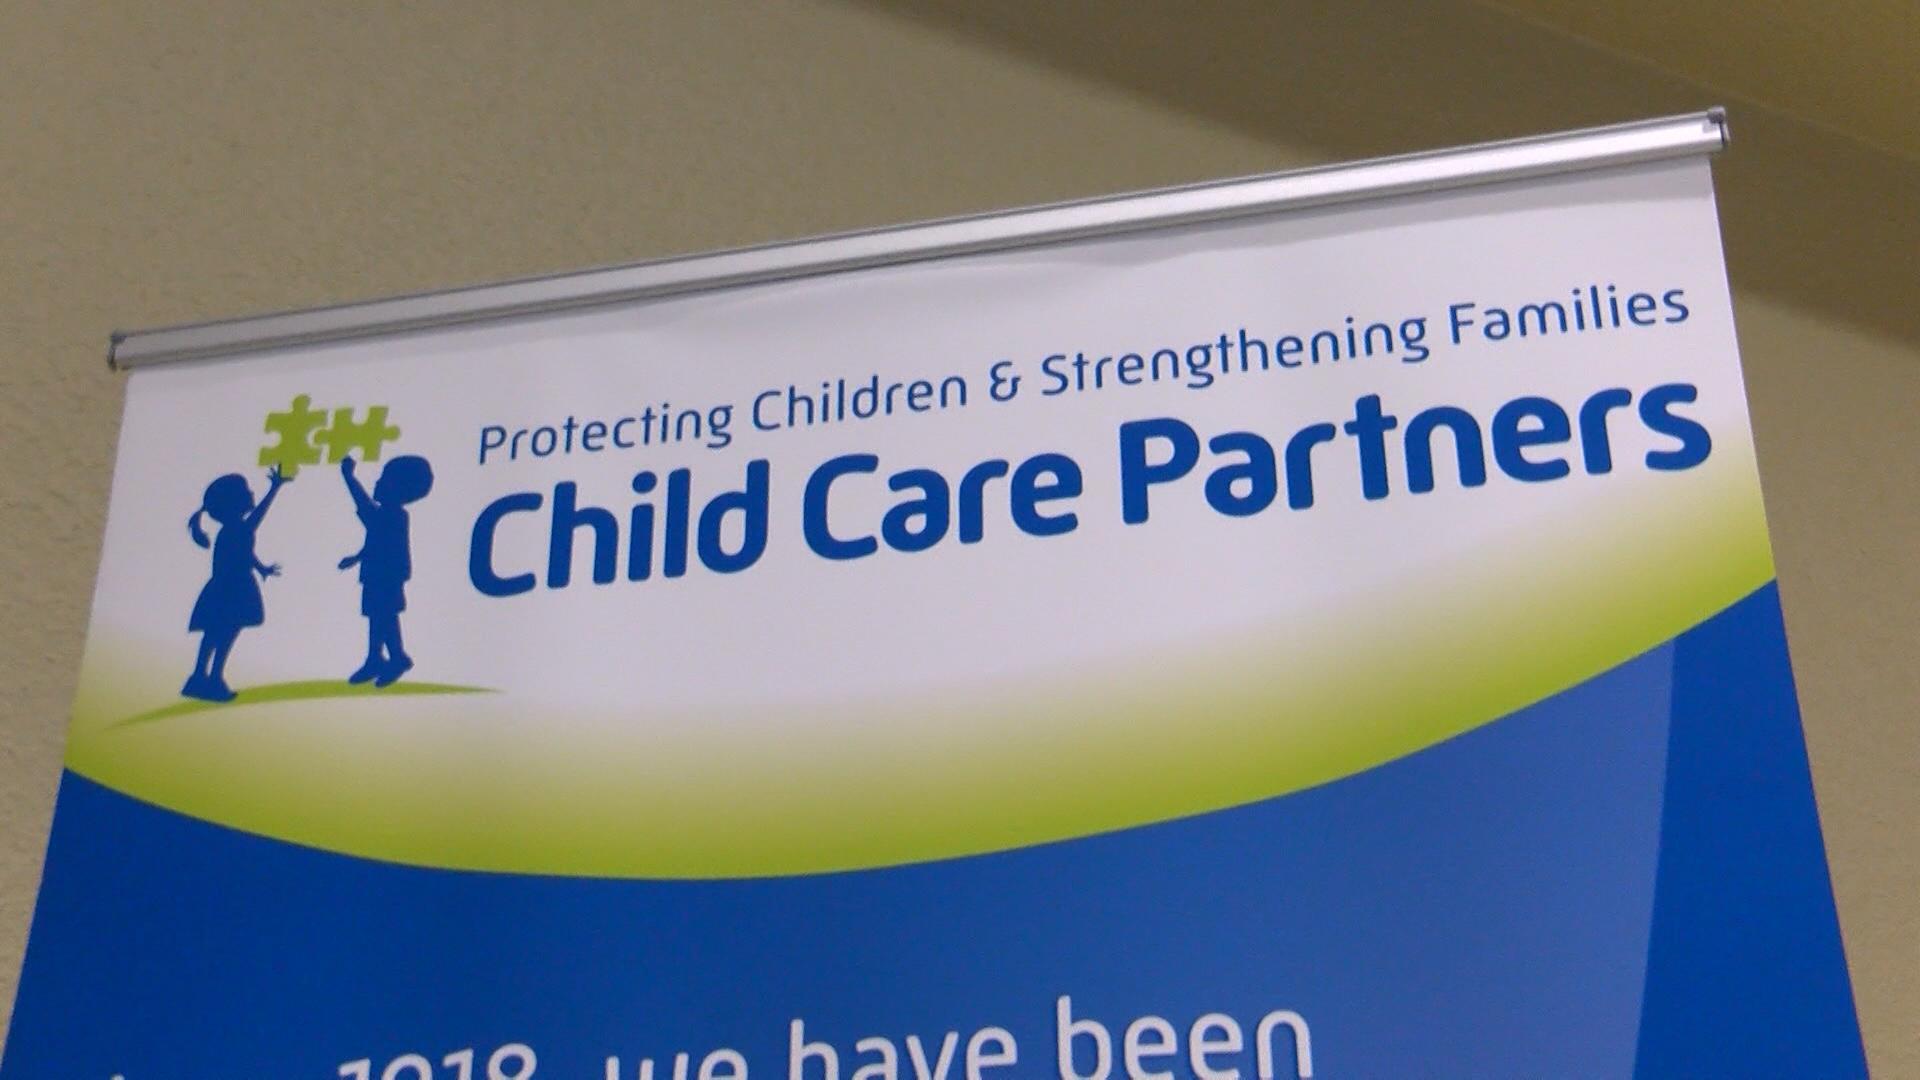 CHILD CARE PARTNERS_1536273405777.jpg.jpg